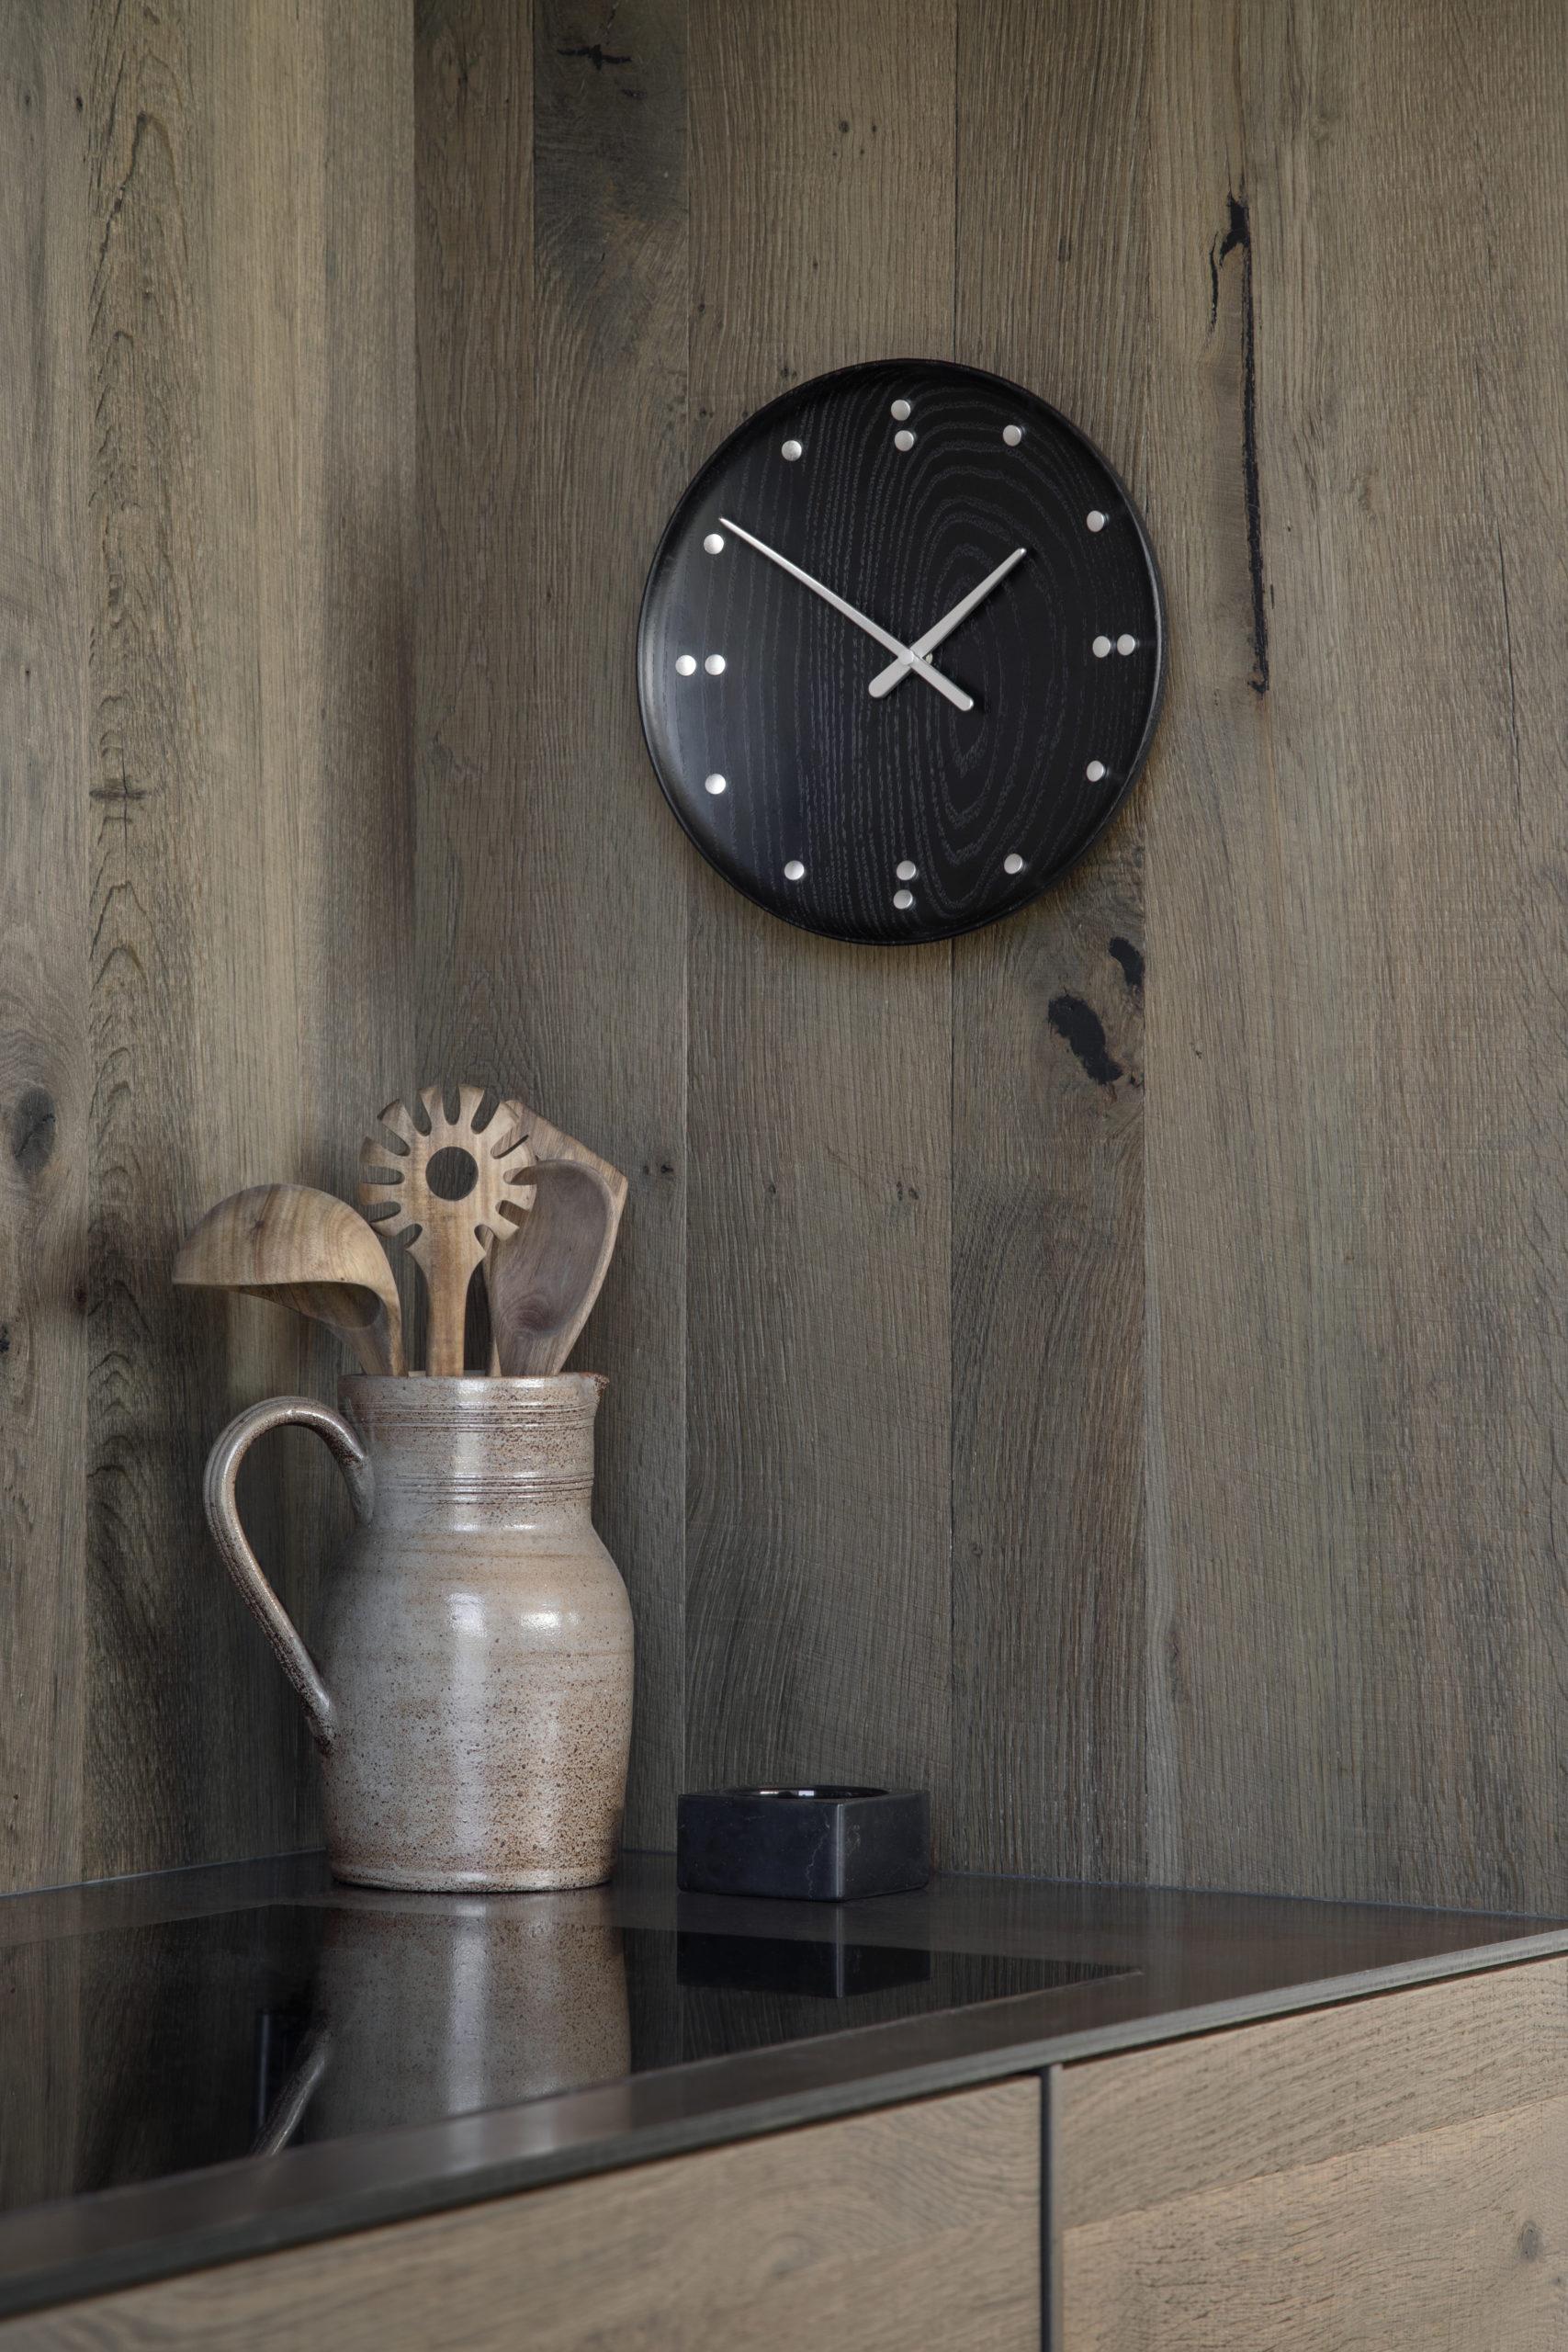 Architectmade-FJ-Clock-Wall-Clock-Ash-Wood-Denmark-Finn-Juhl